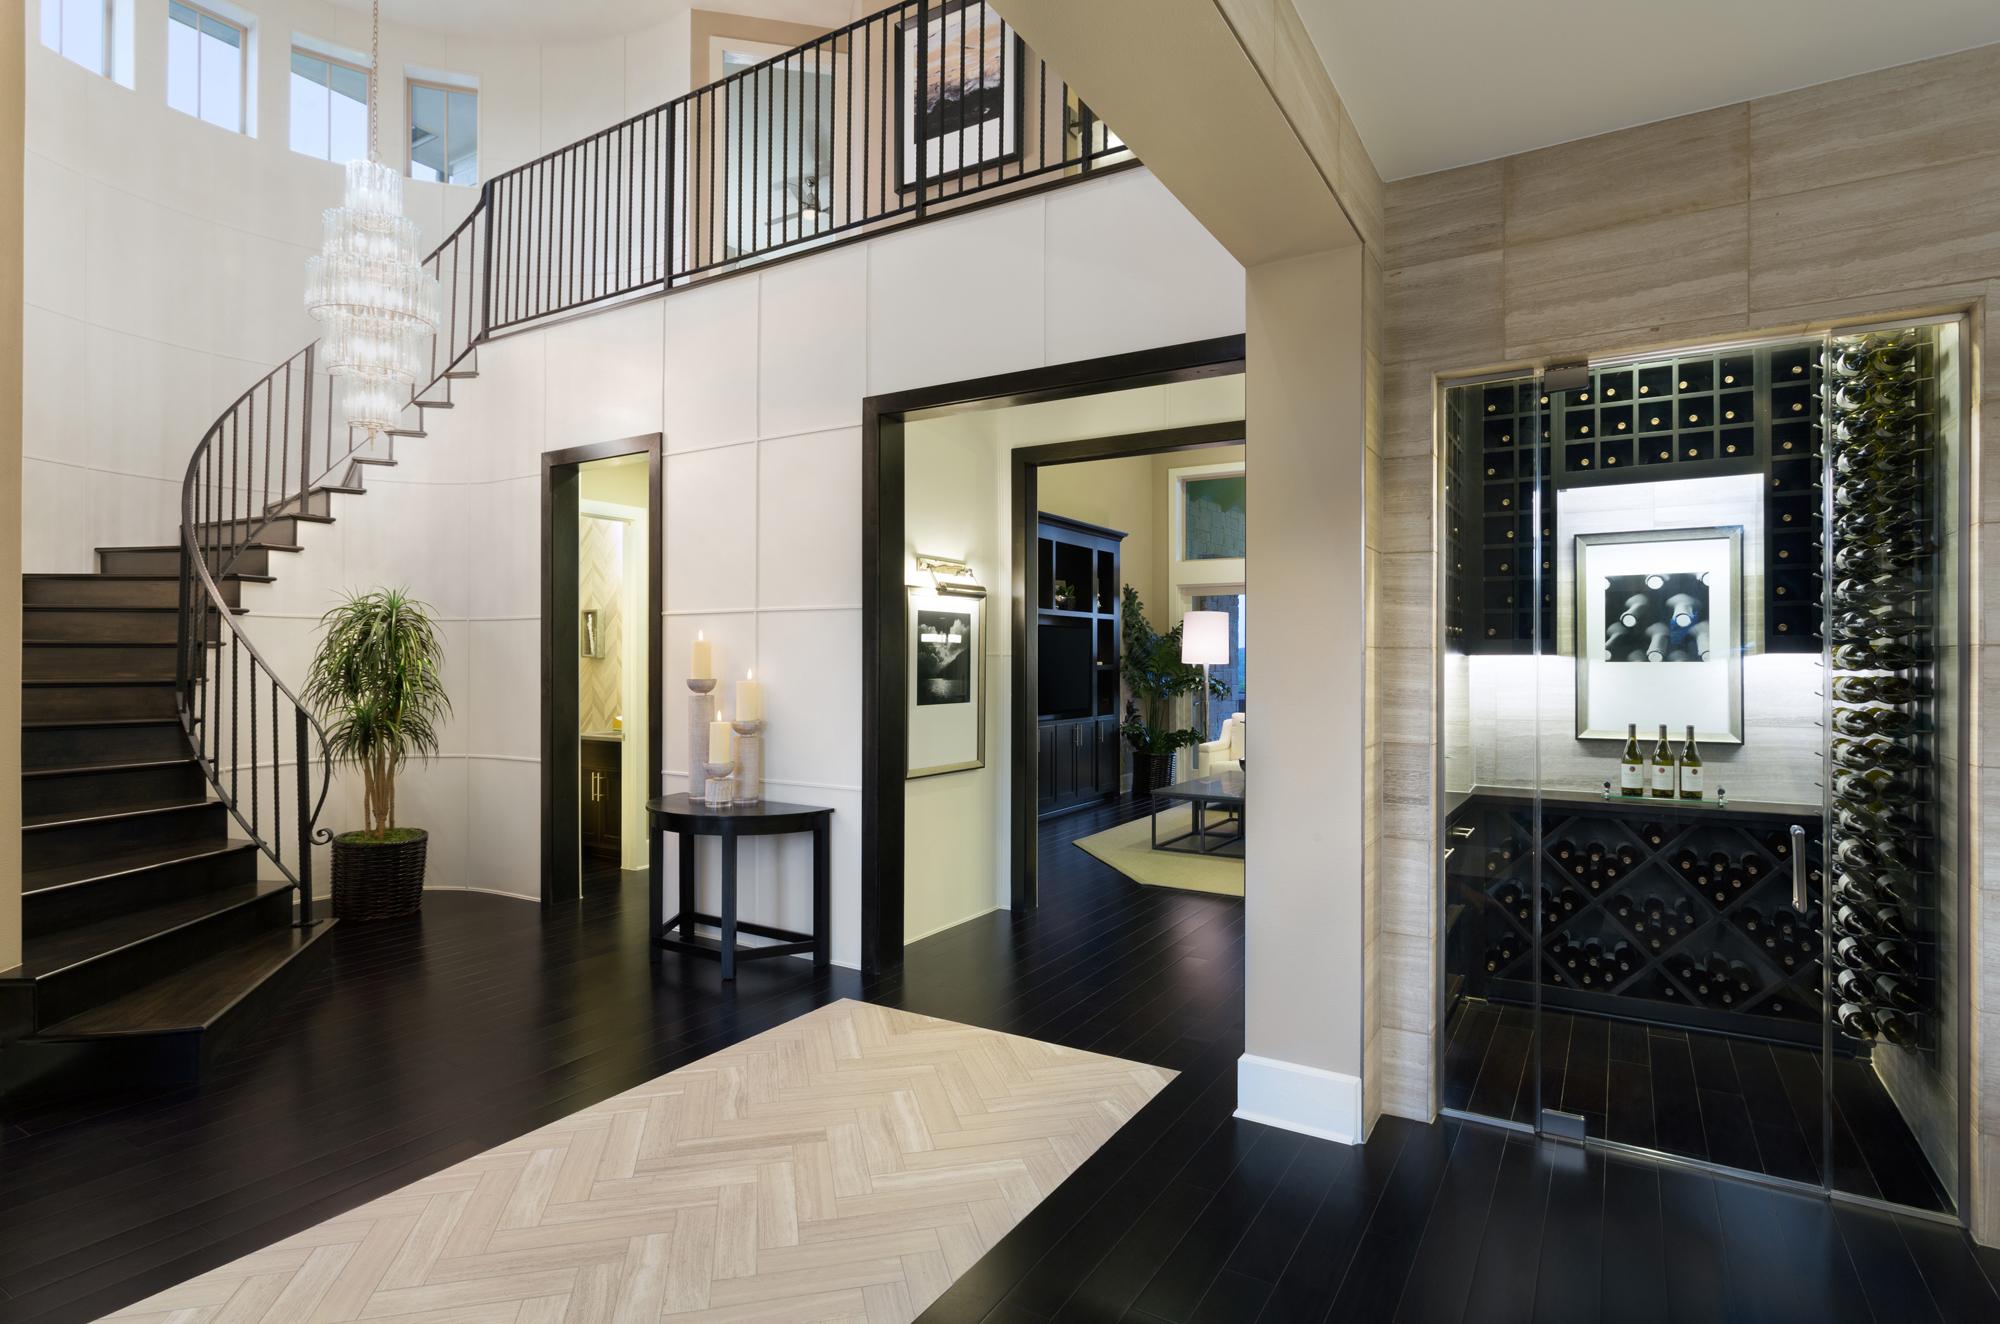 architectural-photography-houston-texas.jpg